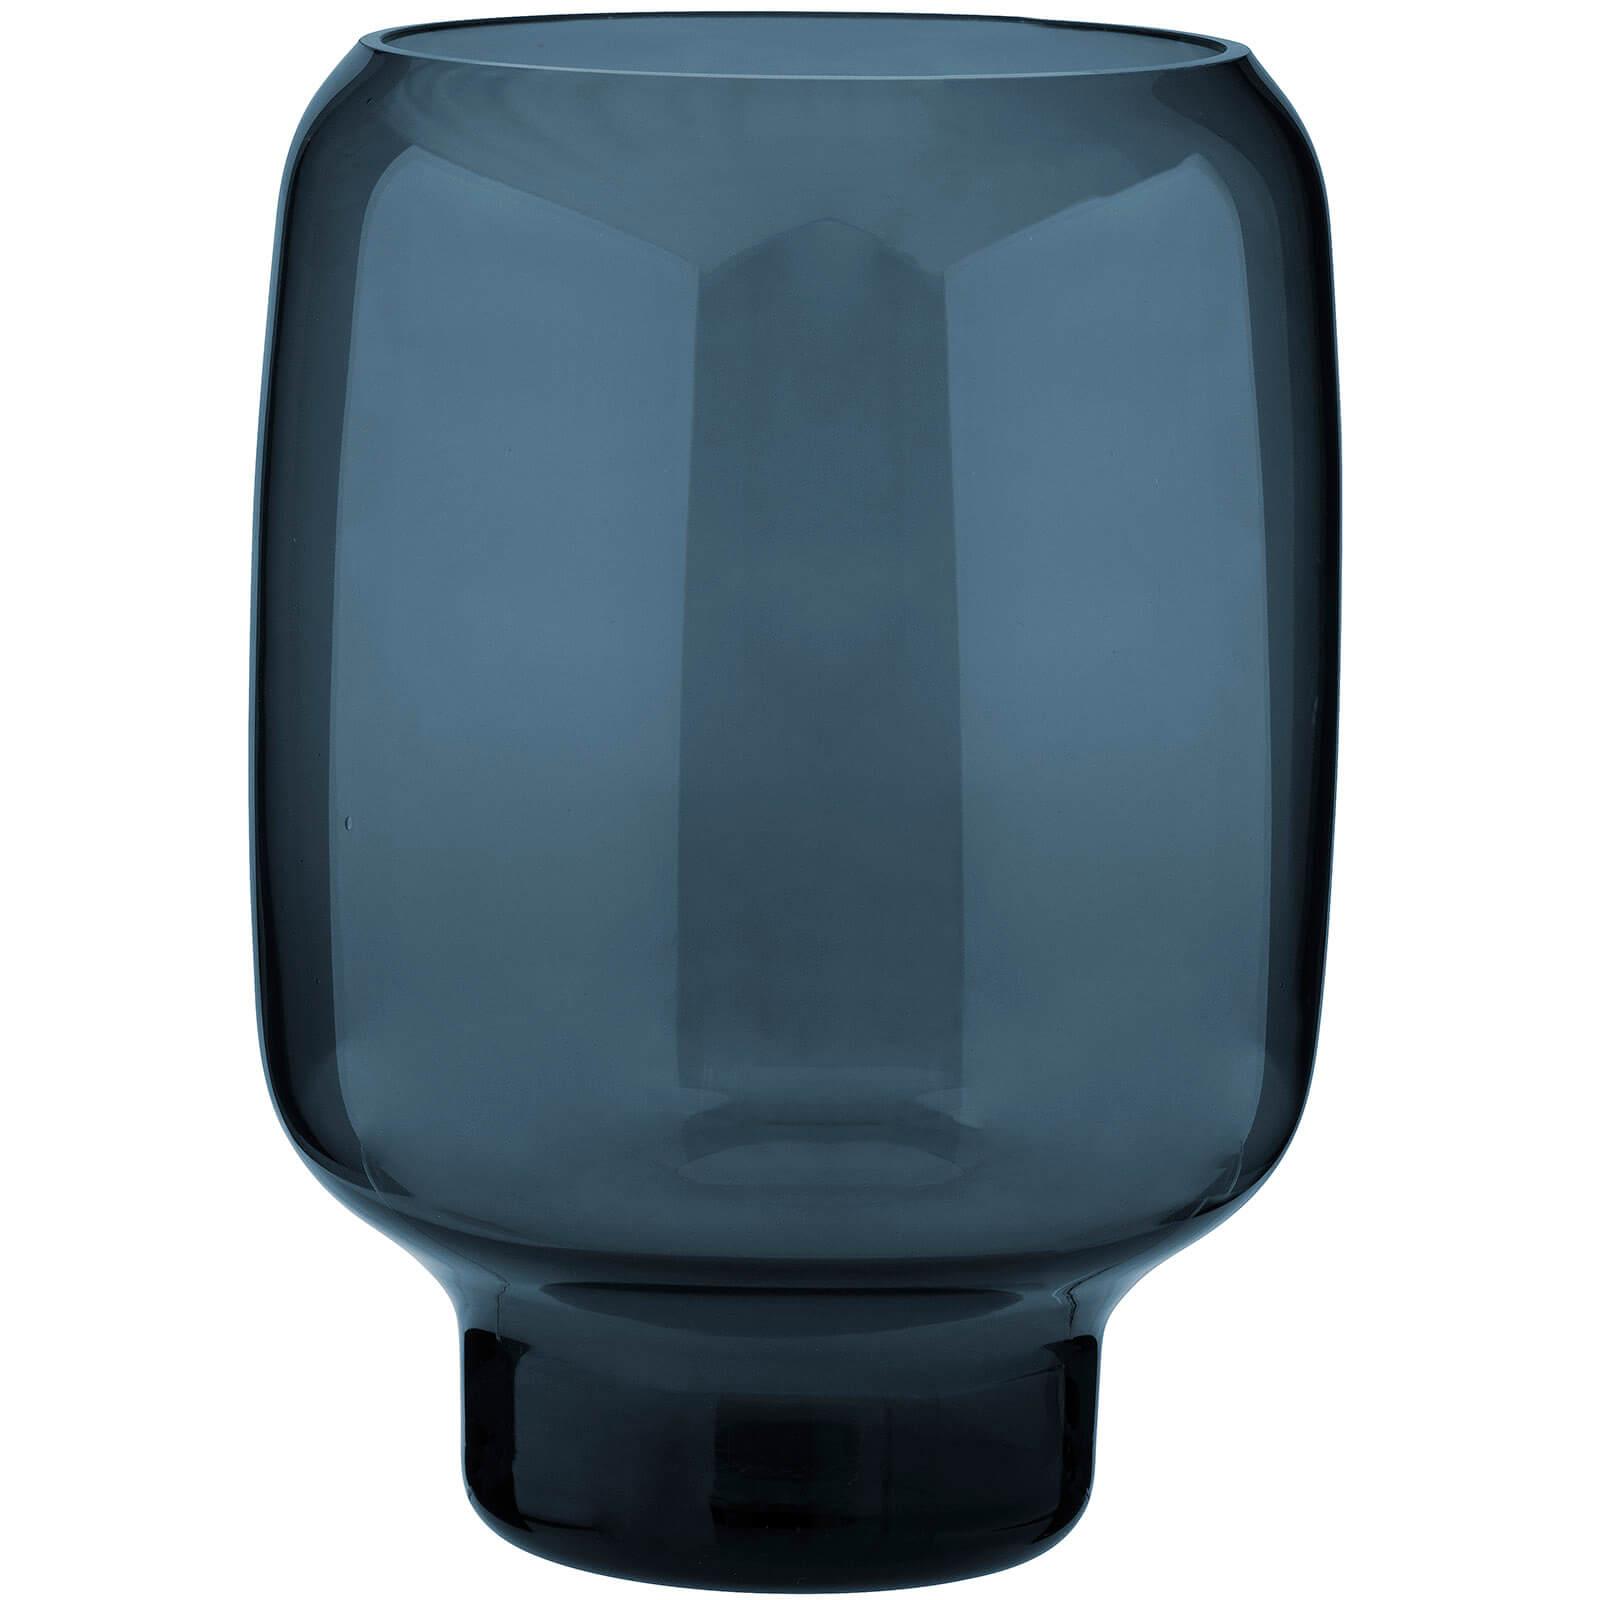 Stelton Small Hoop Vase - 20cm - Midnight Blue